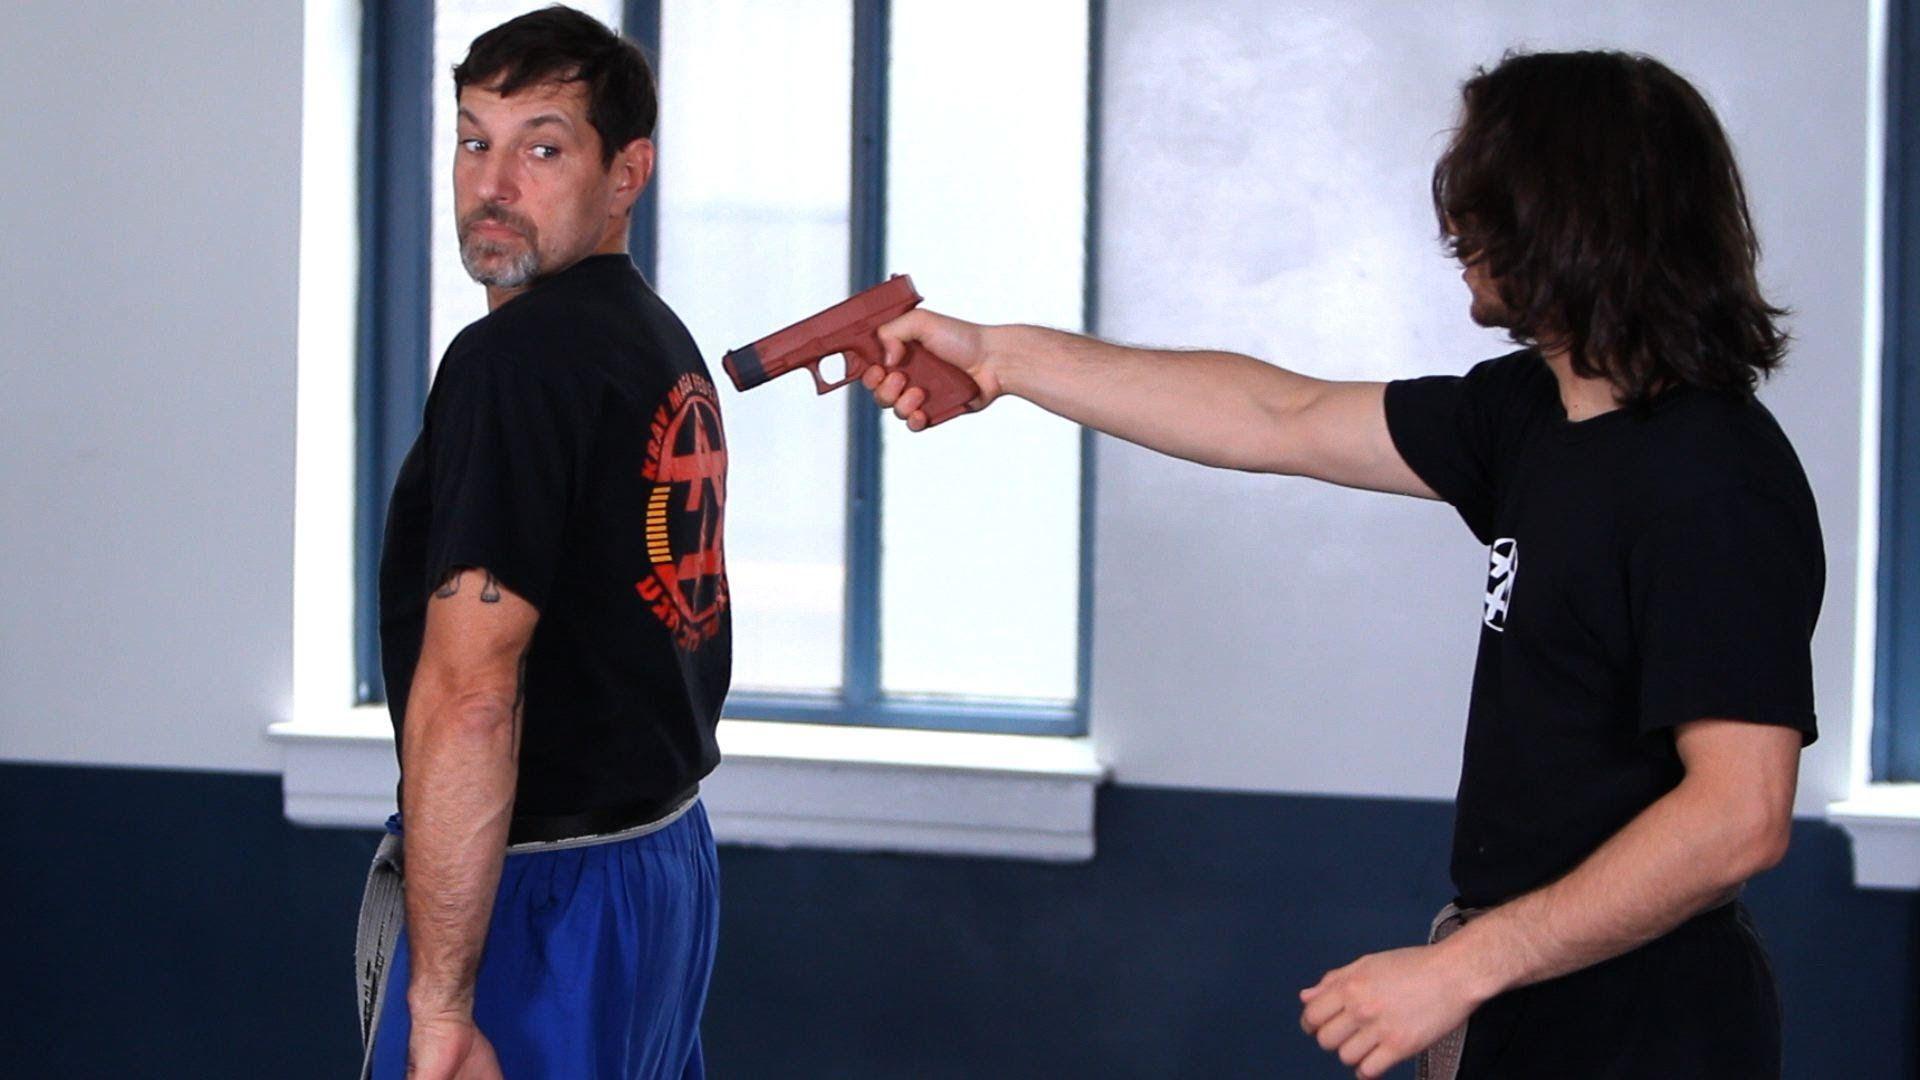 How to Defend against Gun from the Rear   Krav Maga Defense